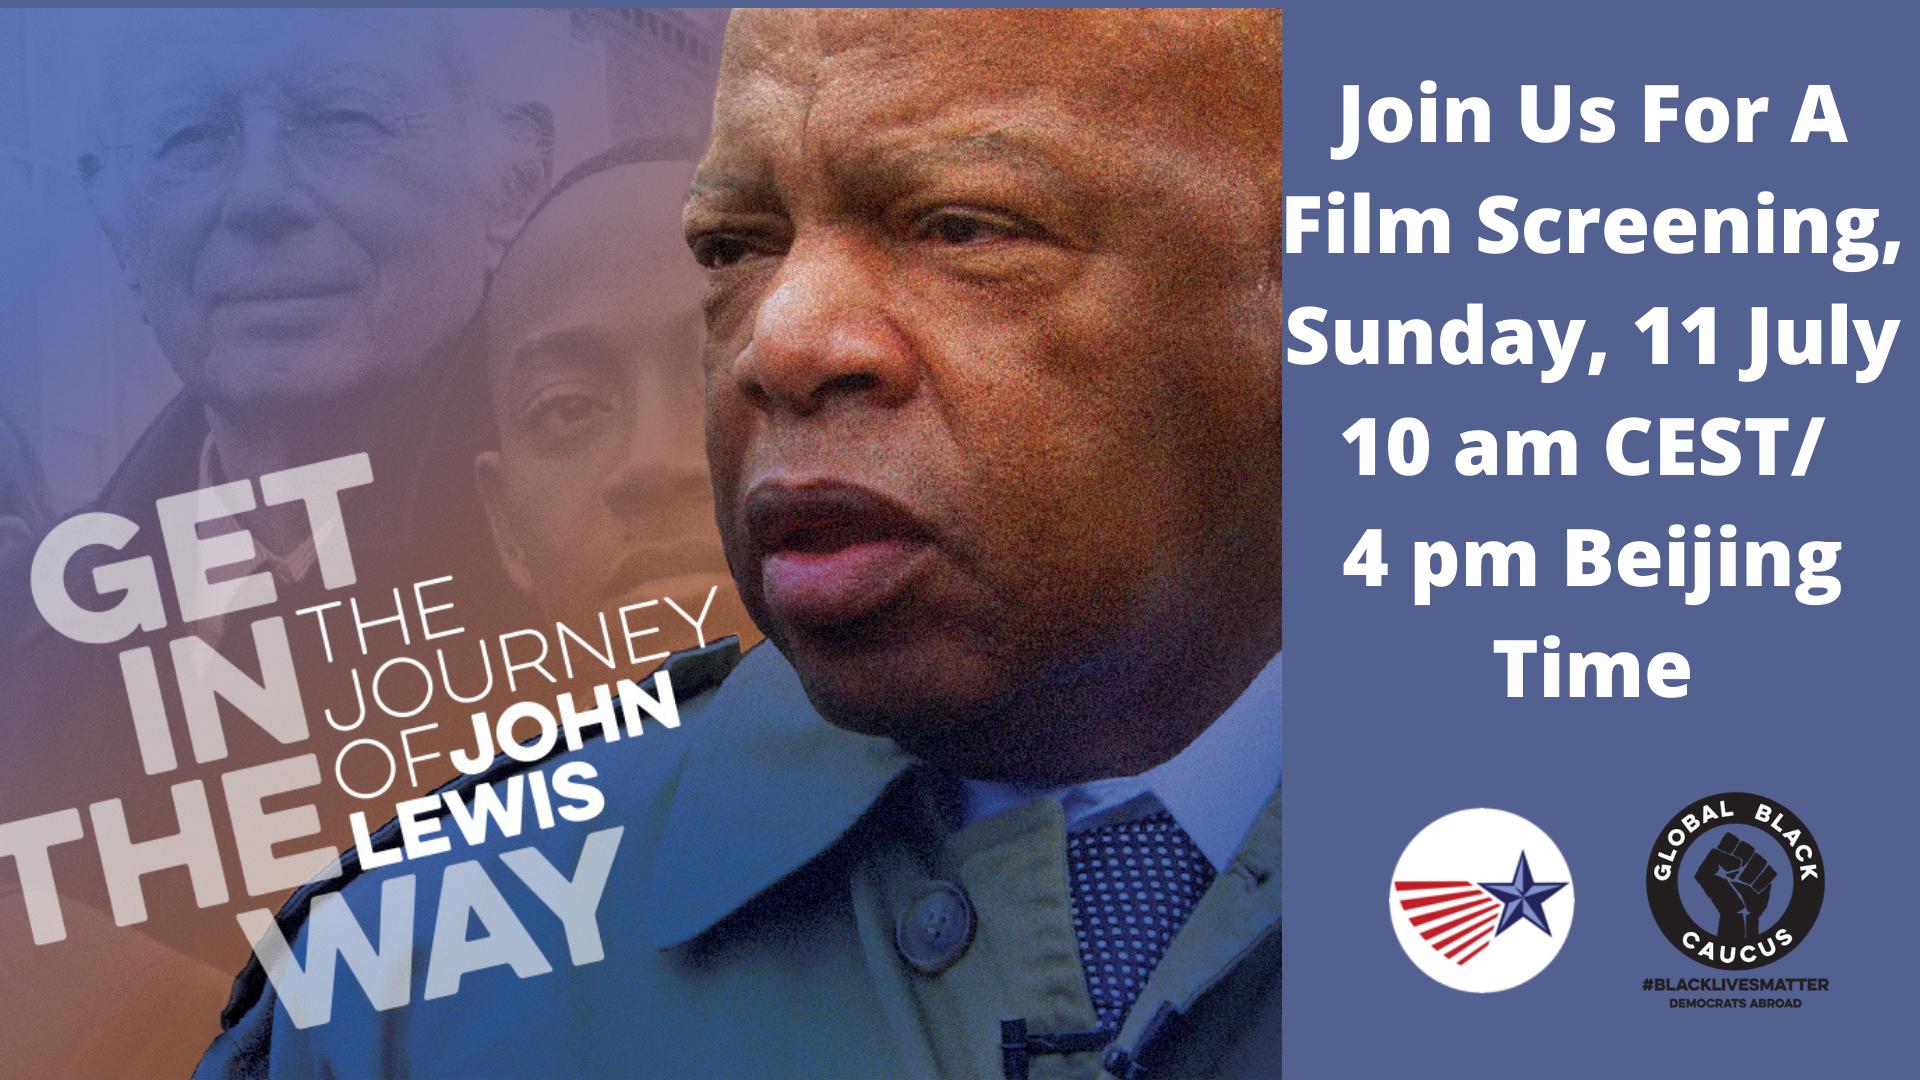 John_lewis_film_screening_1.png